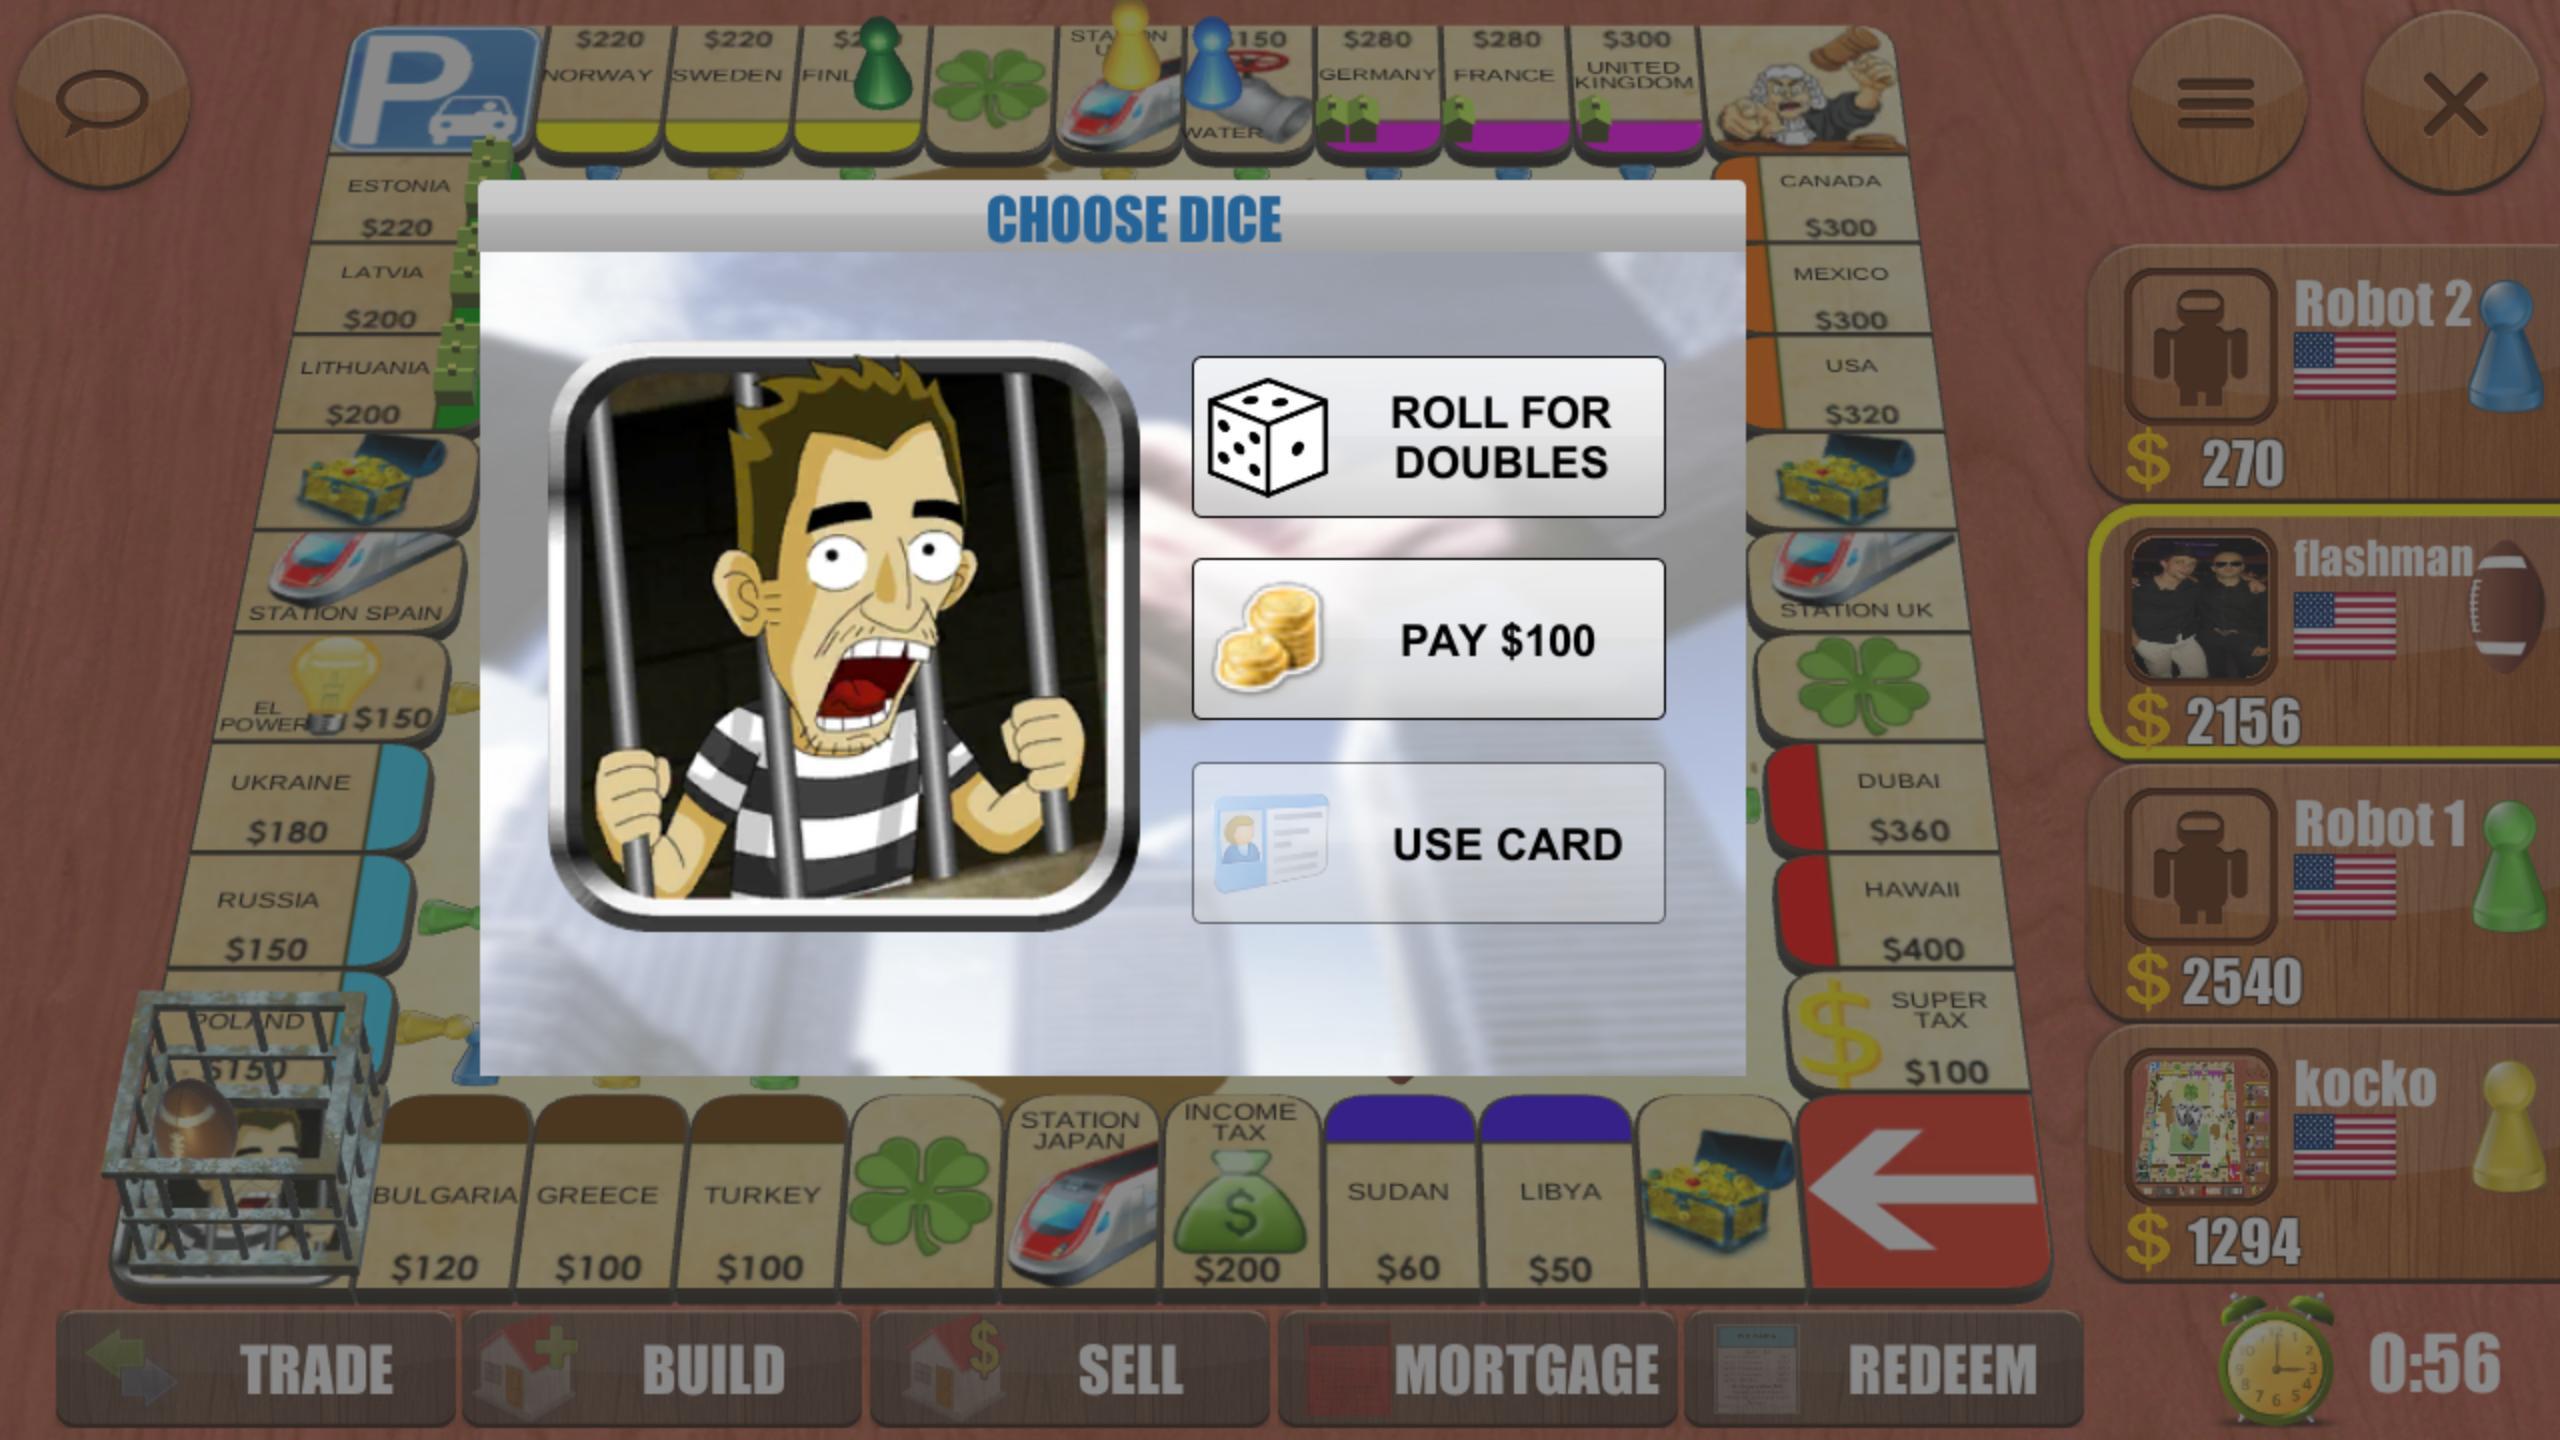 Rento Dice Board Game Online 5.1.9 Screenshot 20